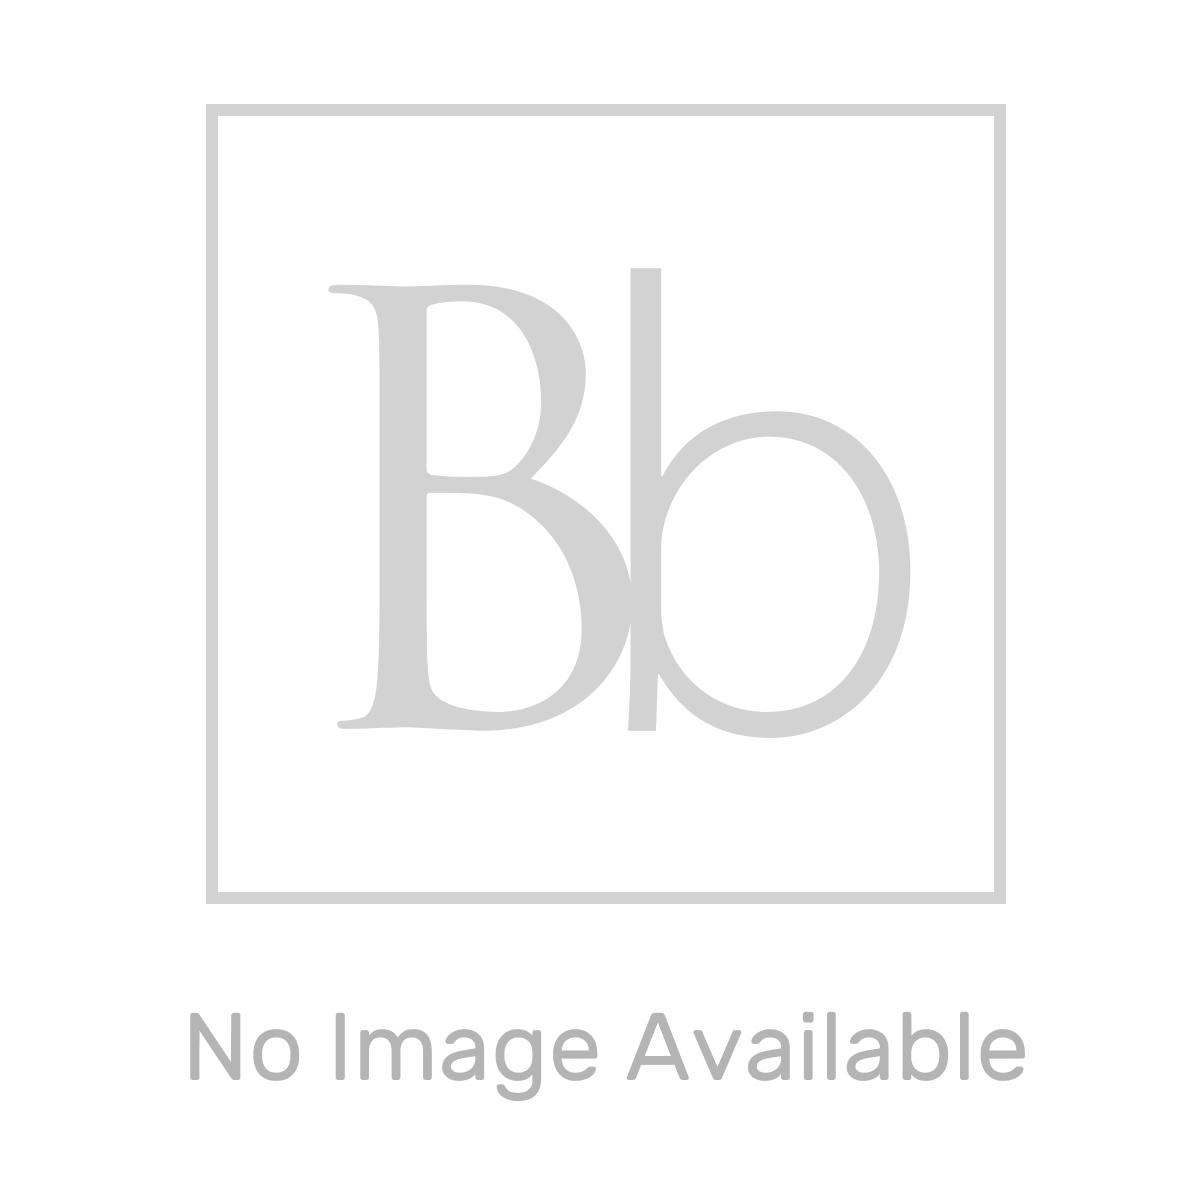 HiB Flare Top Illuminated Double Door Mirrored Cabinet